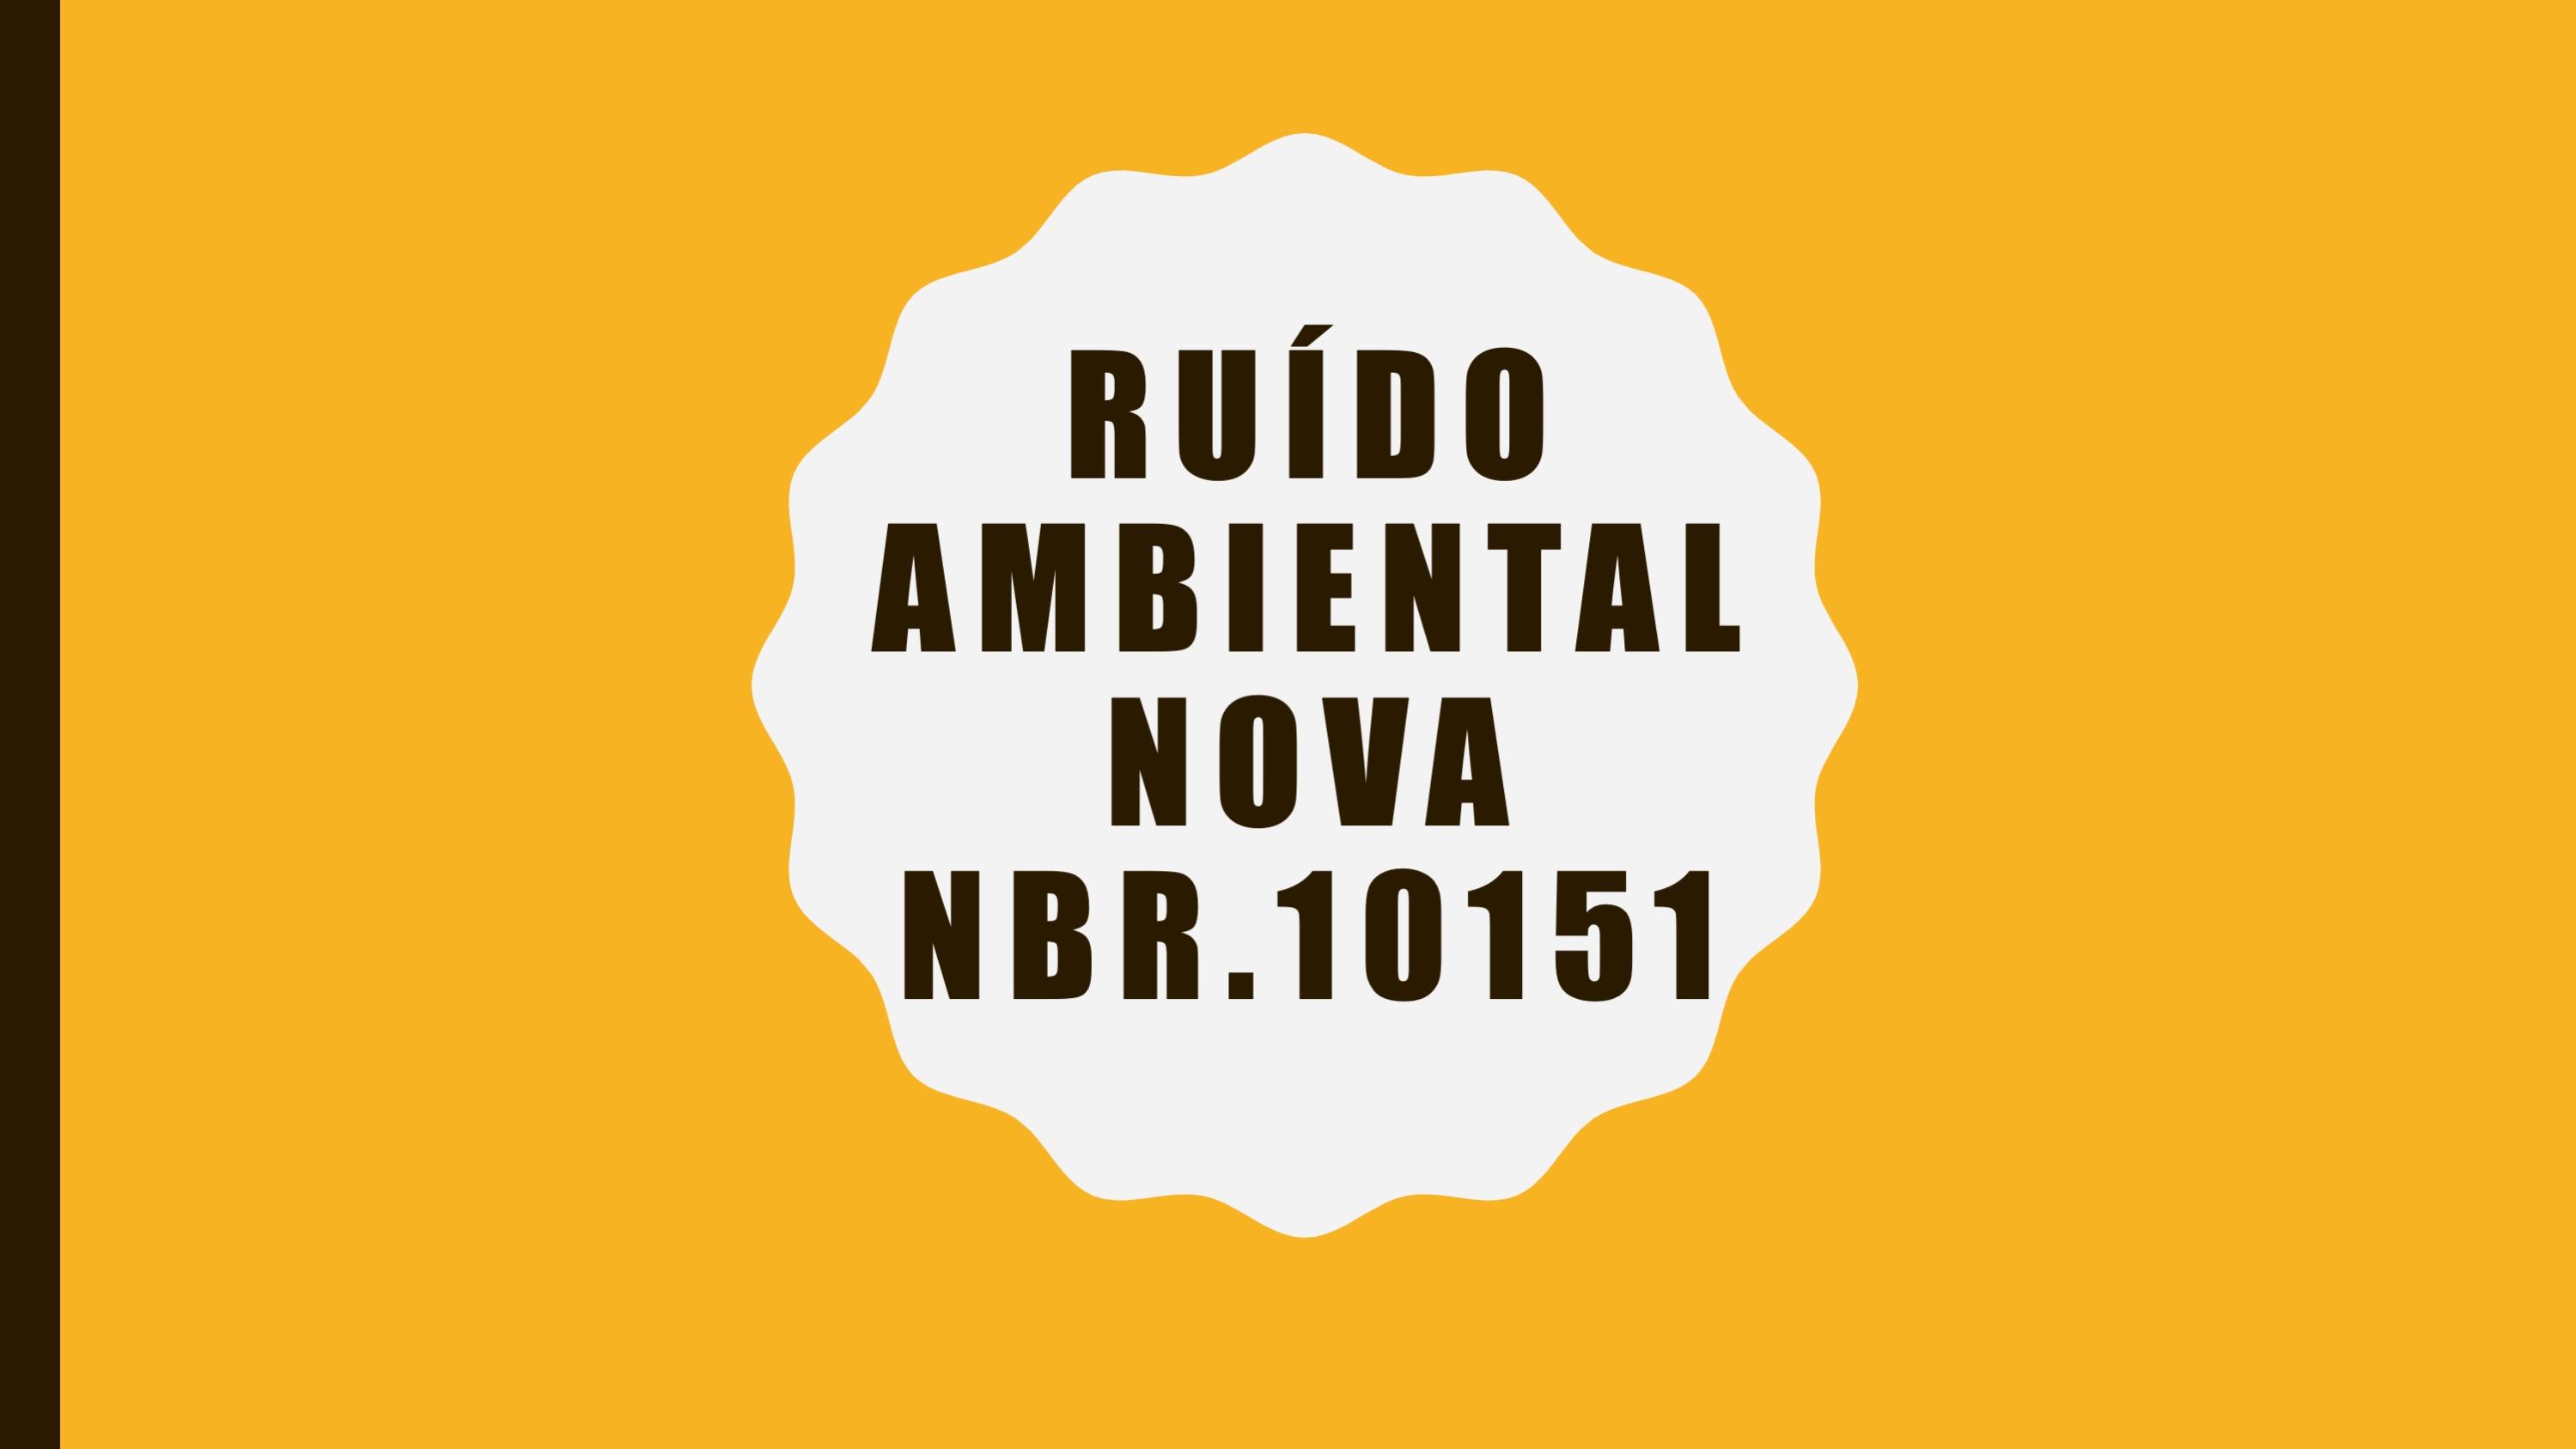 Ruído Ambiental – Nova NBR.10151